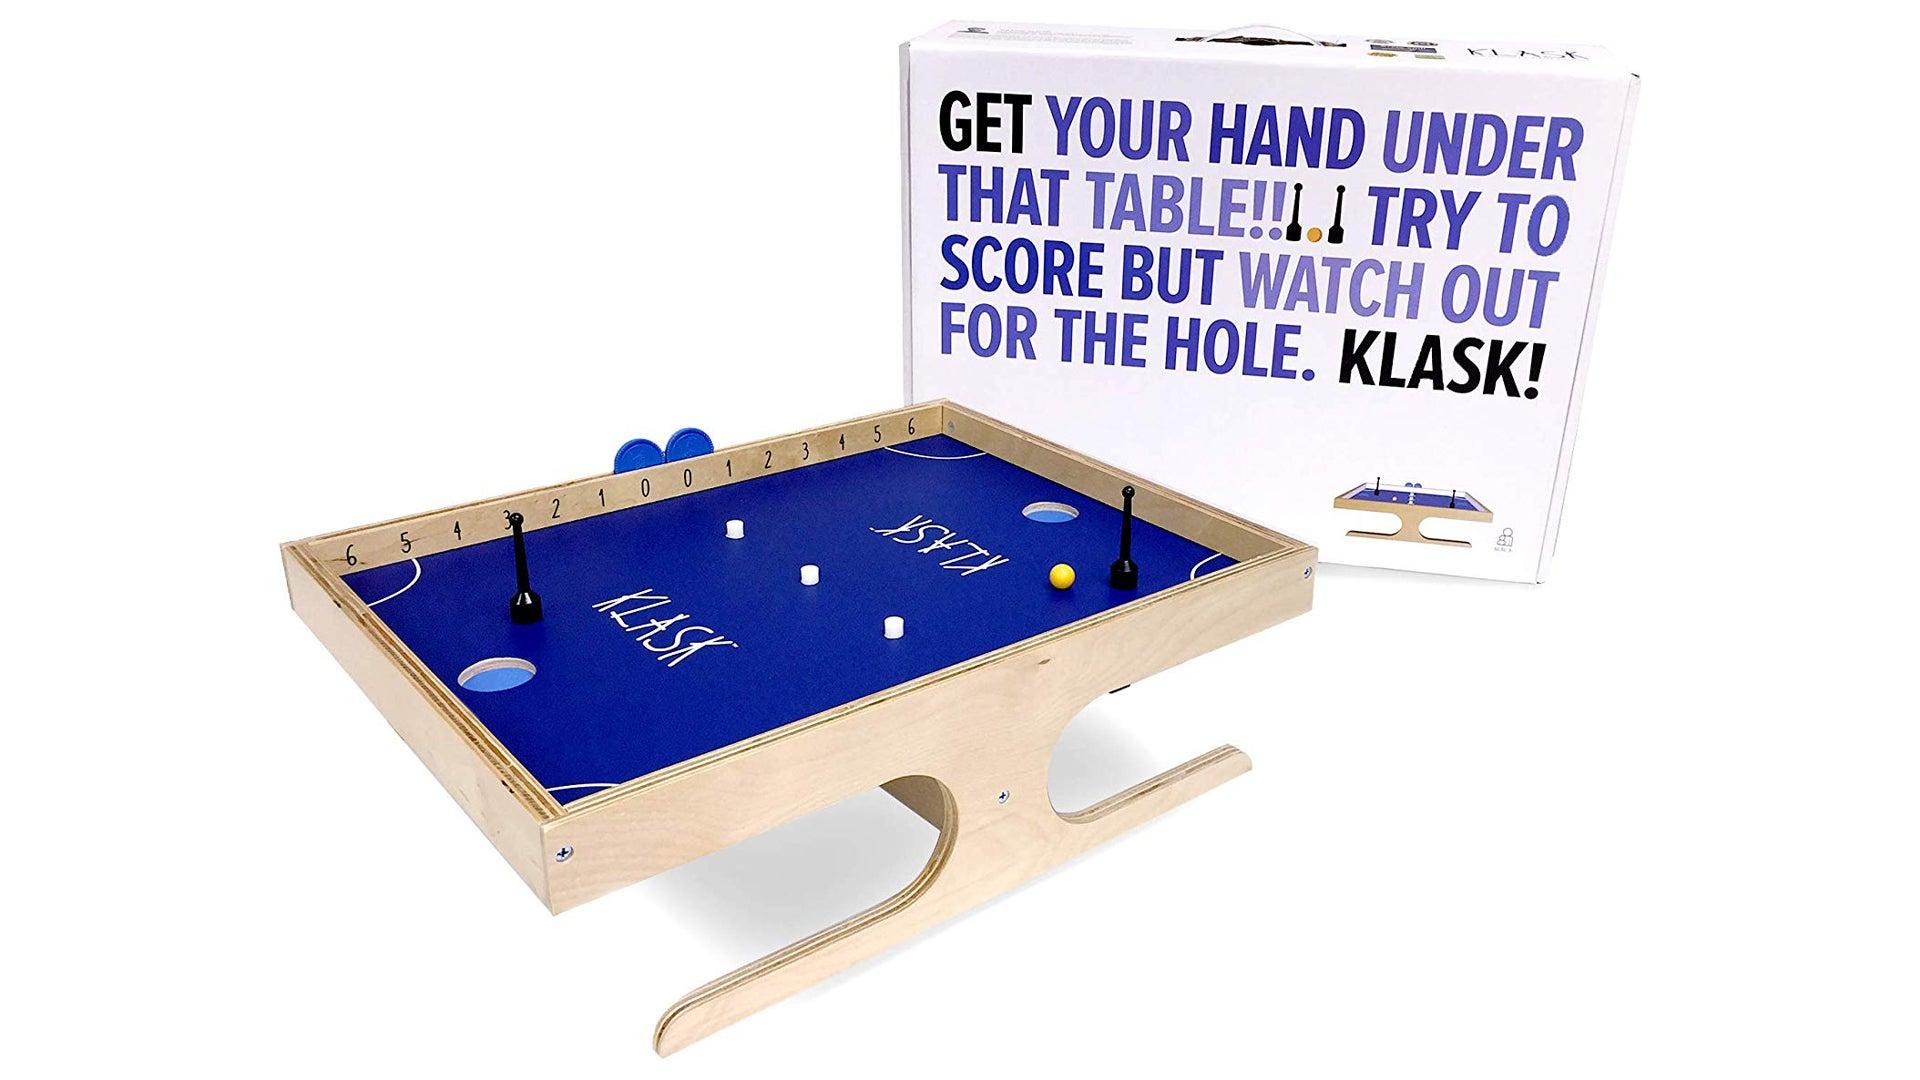 Photograph of Klask board and box